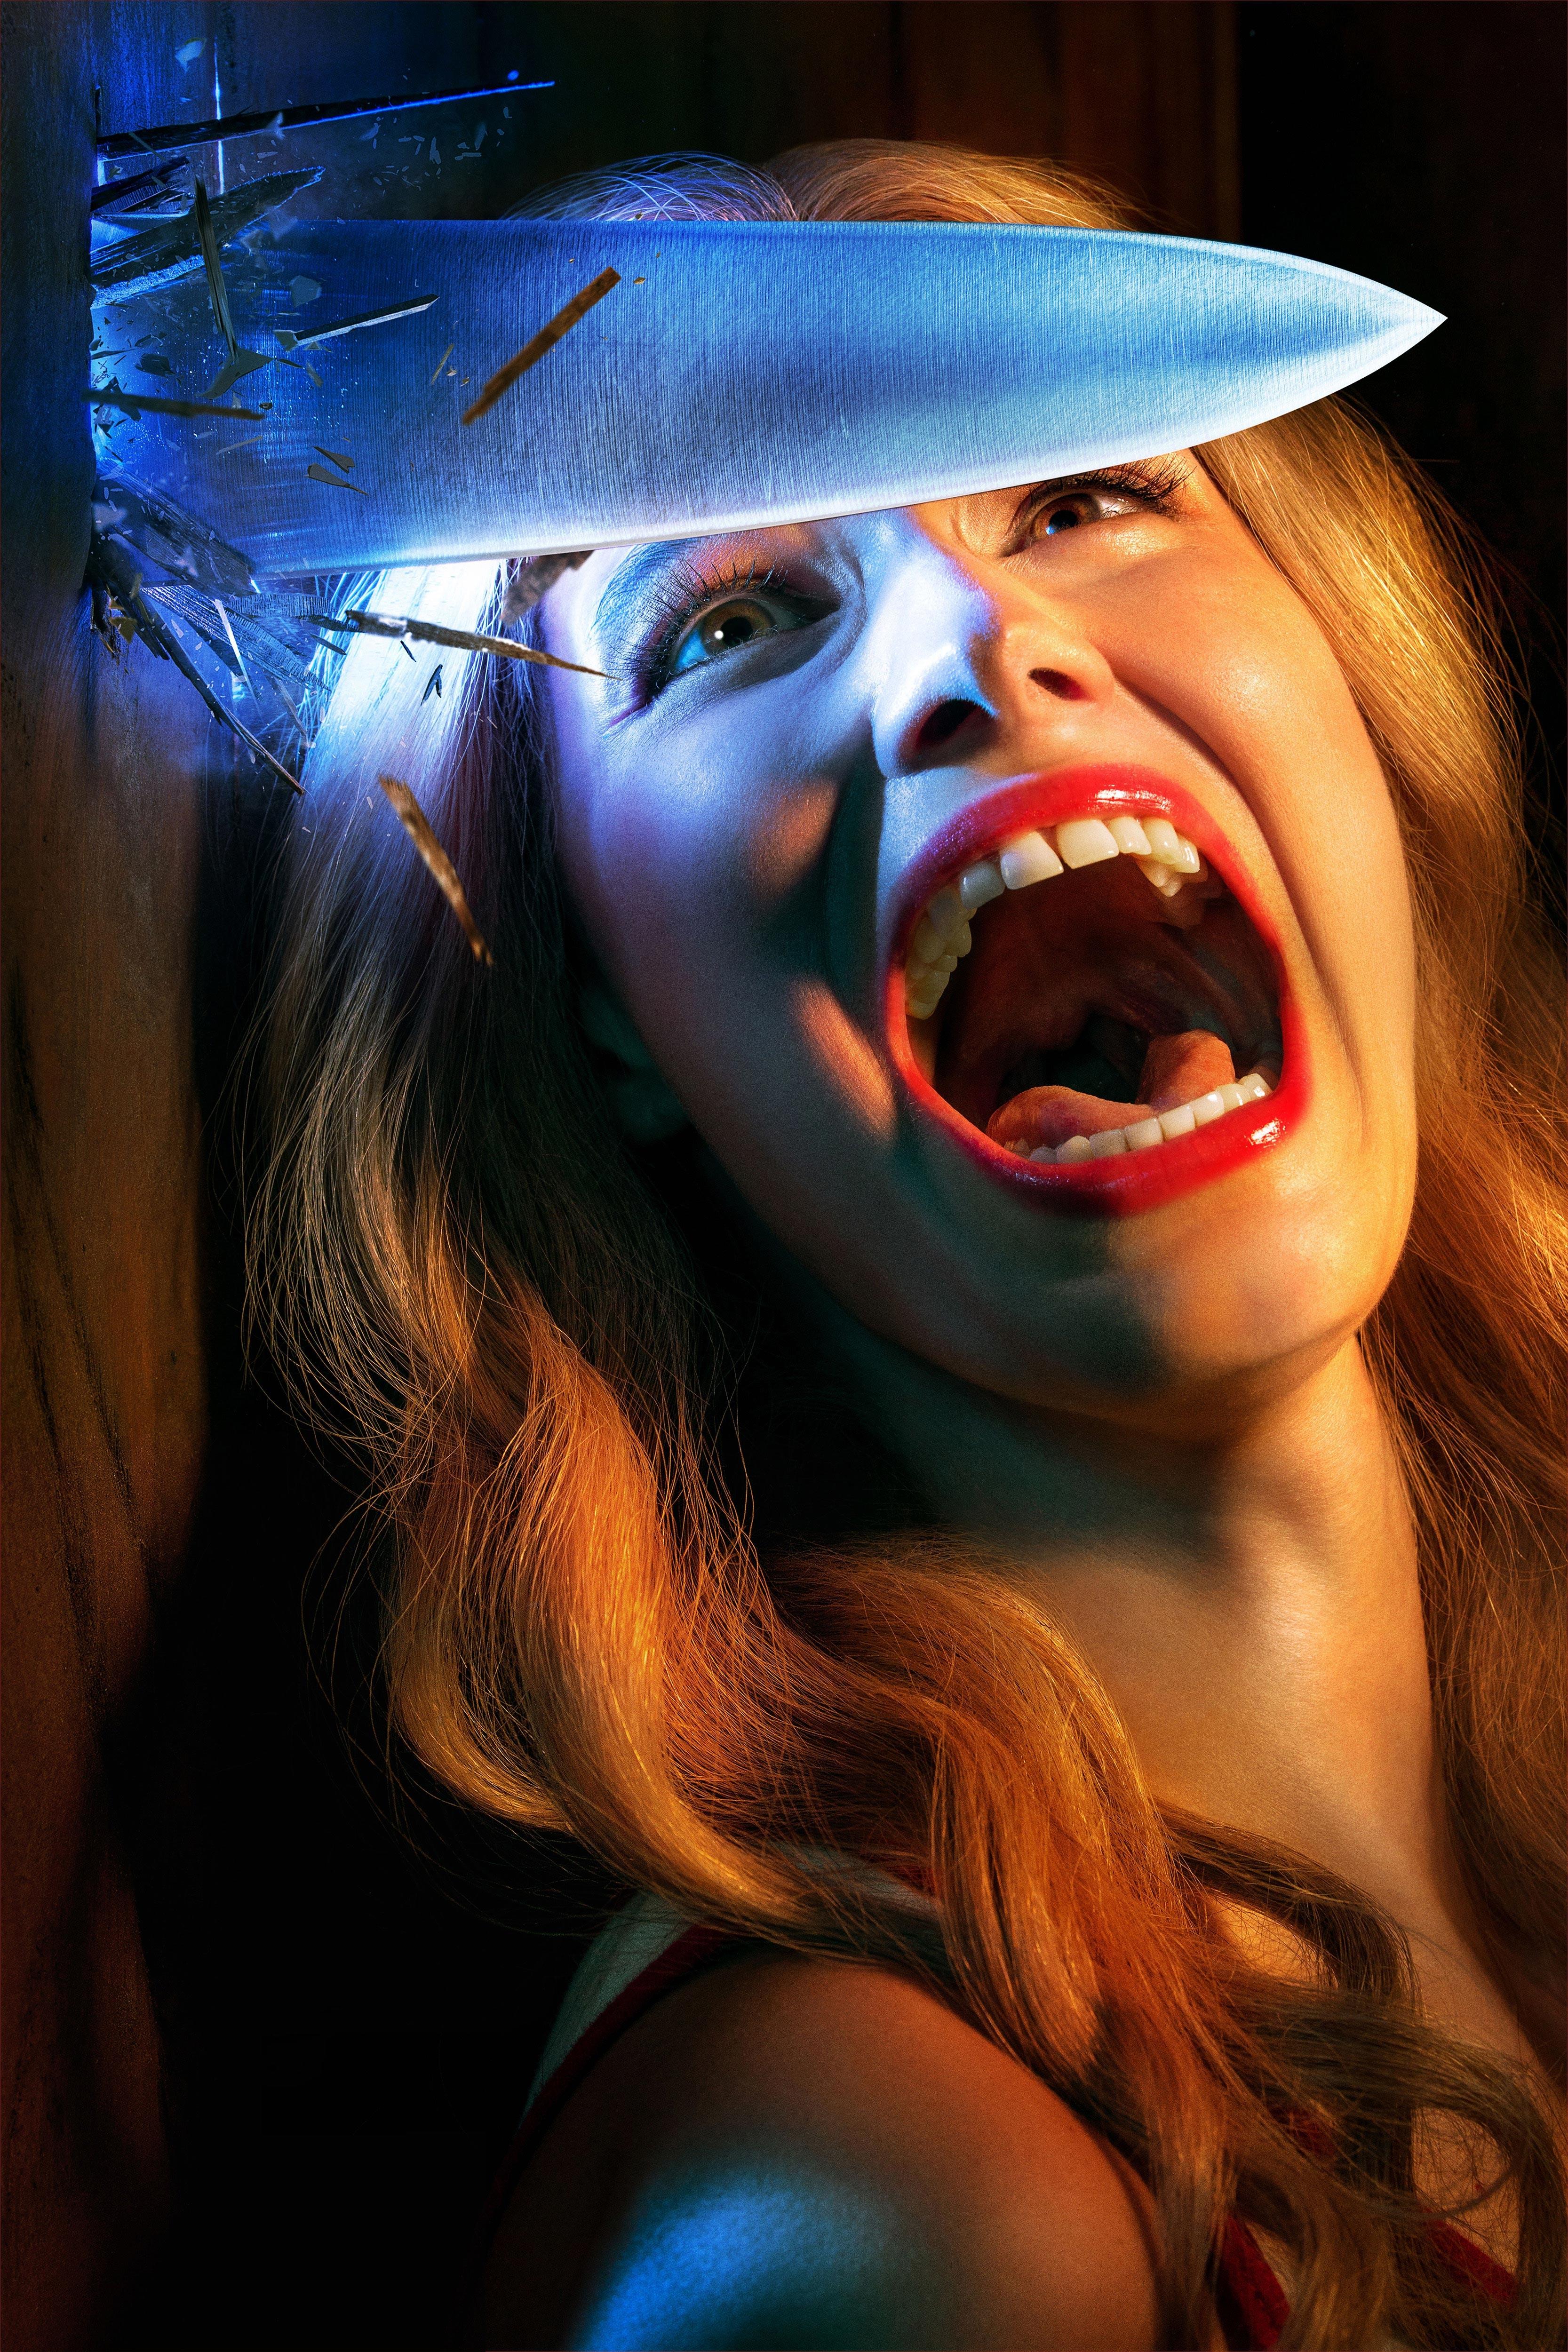 American Horror Story 1984 Wallpaper Hd Tv Series 4k Wallpapers